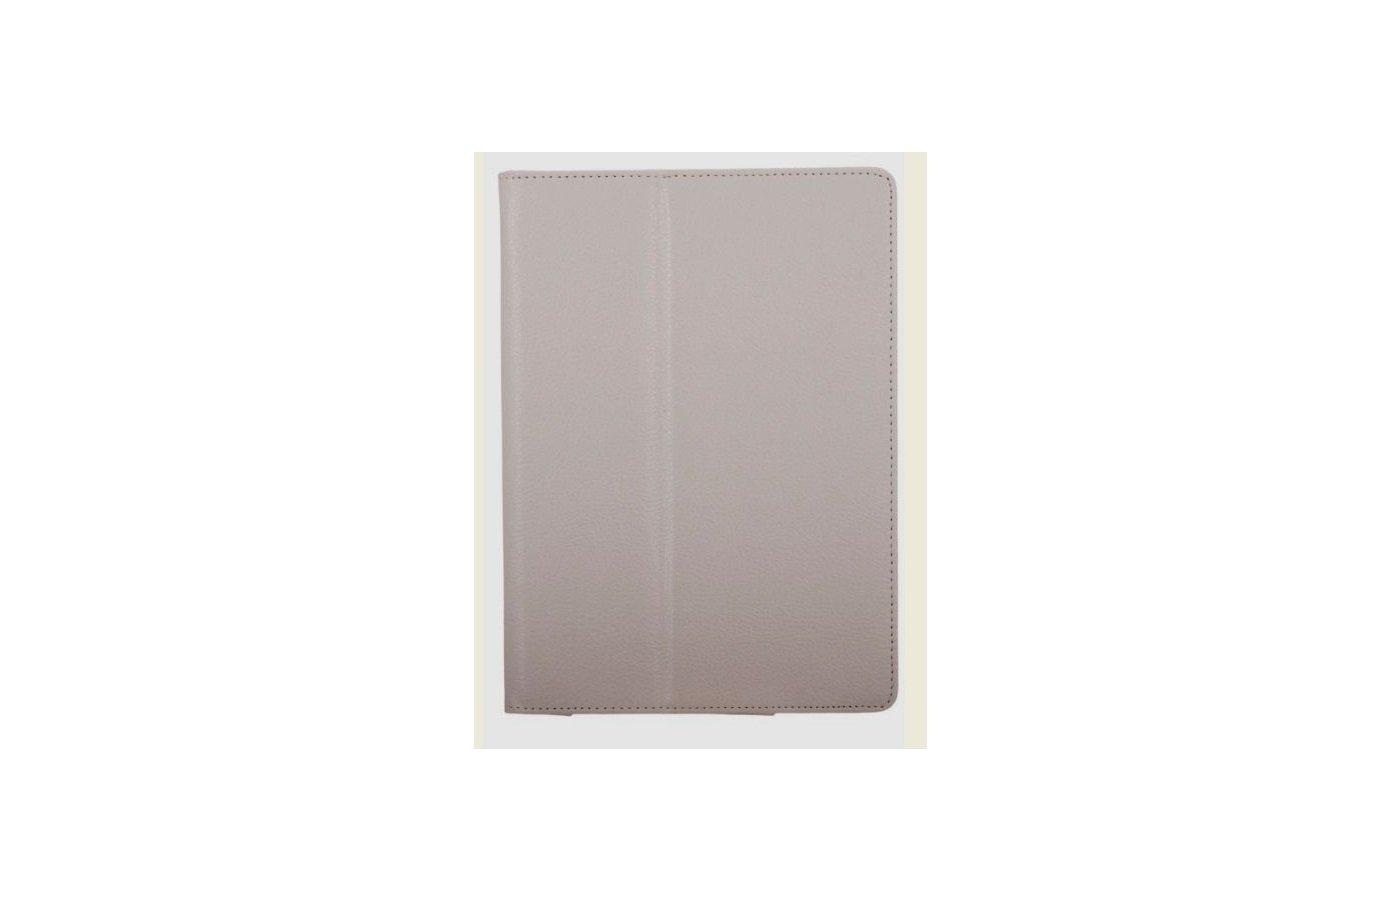 Чехол для планшетного ПК IT BAGGAGE для LENOVO Idea Tab 2 A10-70 10 искус. кожа белый ITLN2A102-0